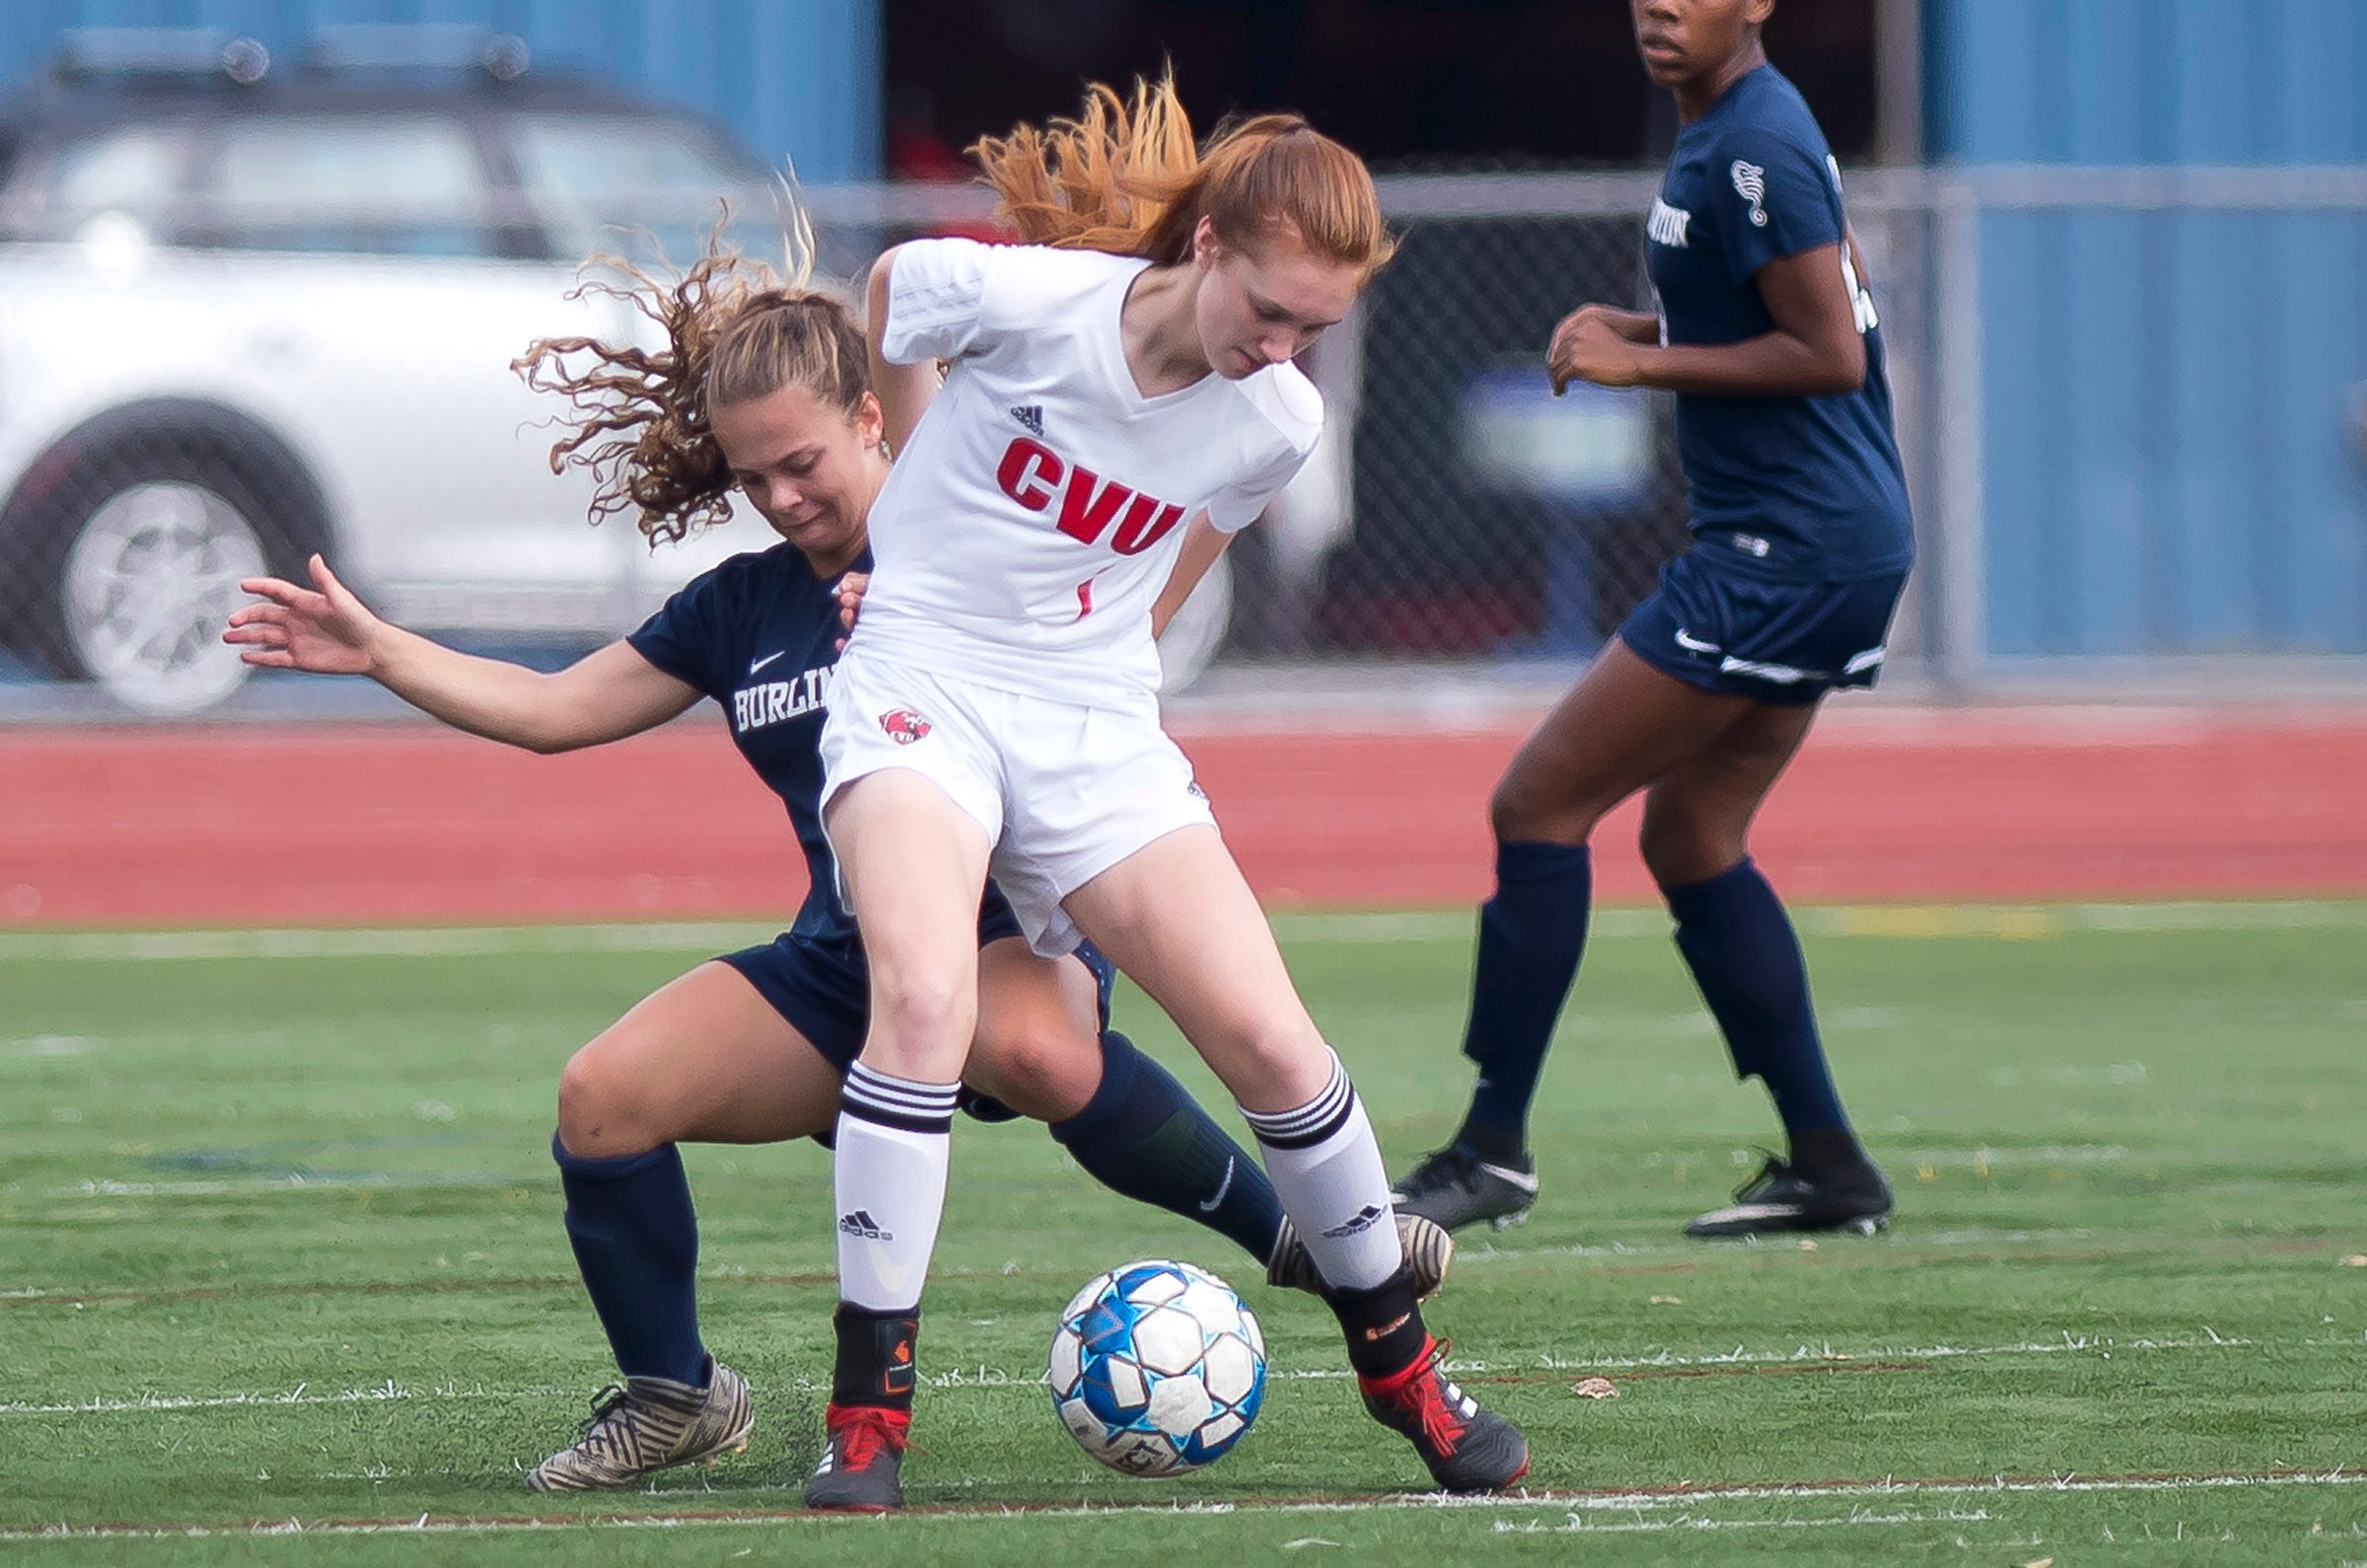 Vermont girls soccer: Varsity Insider Week 6 power rankings | Burlington Free Press